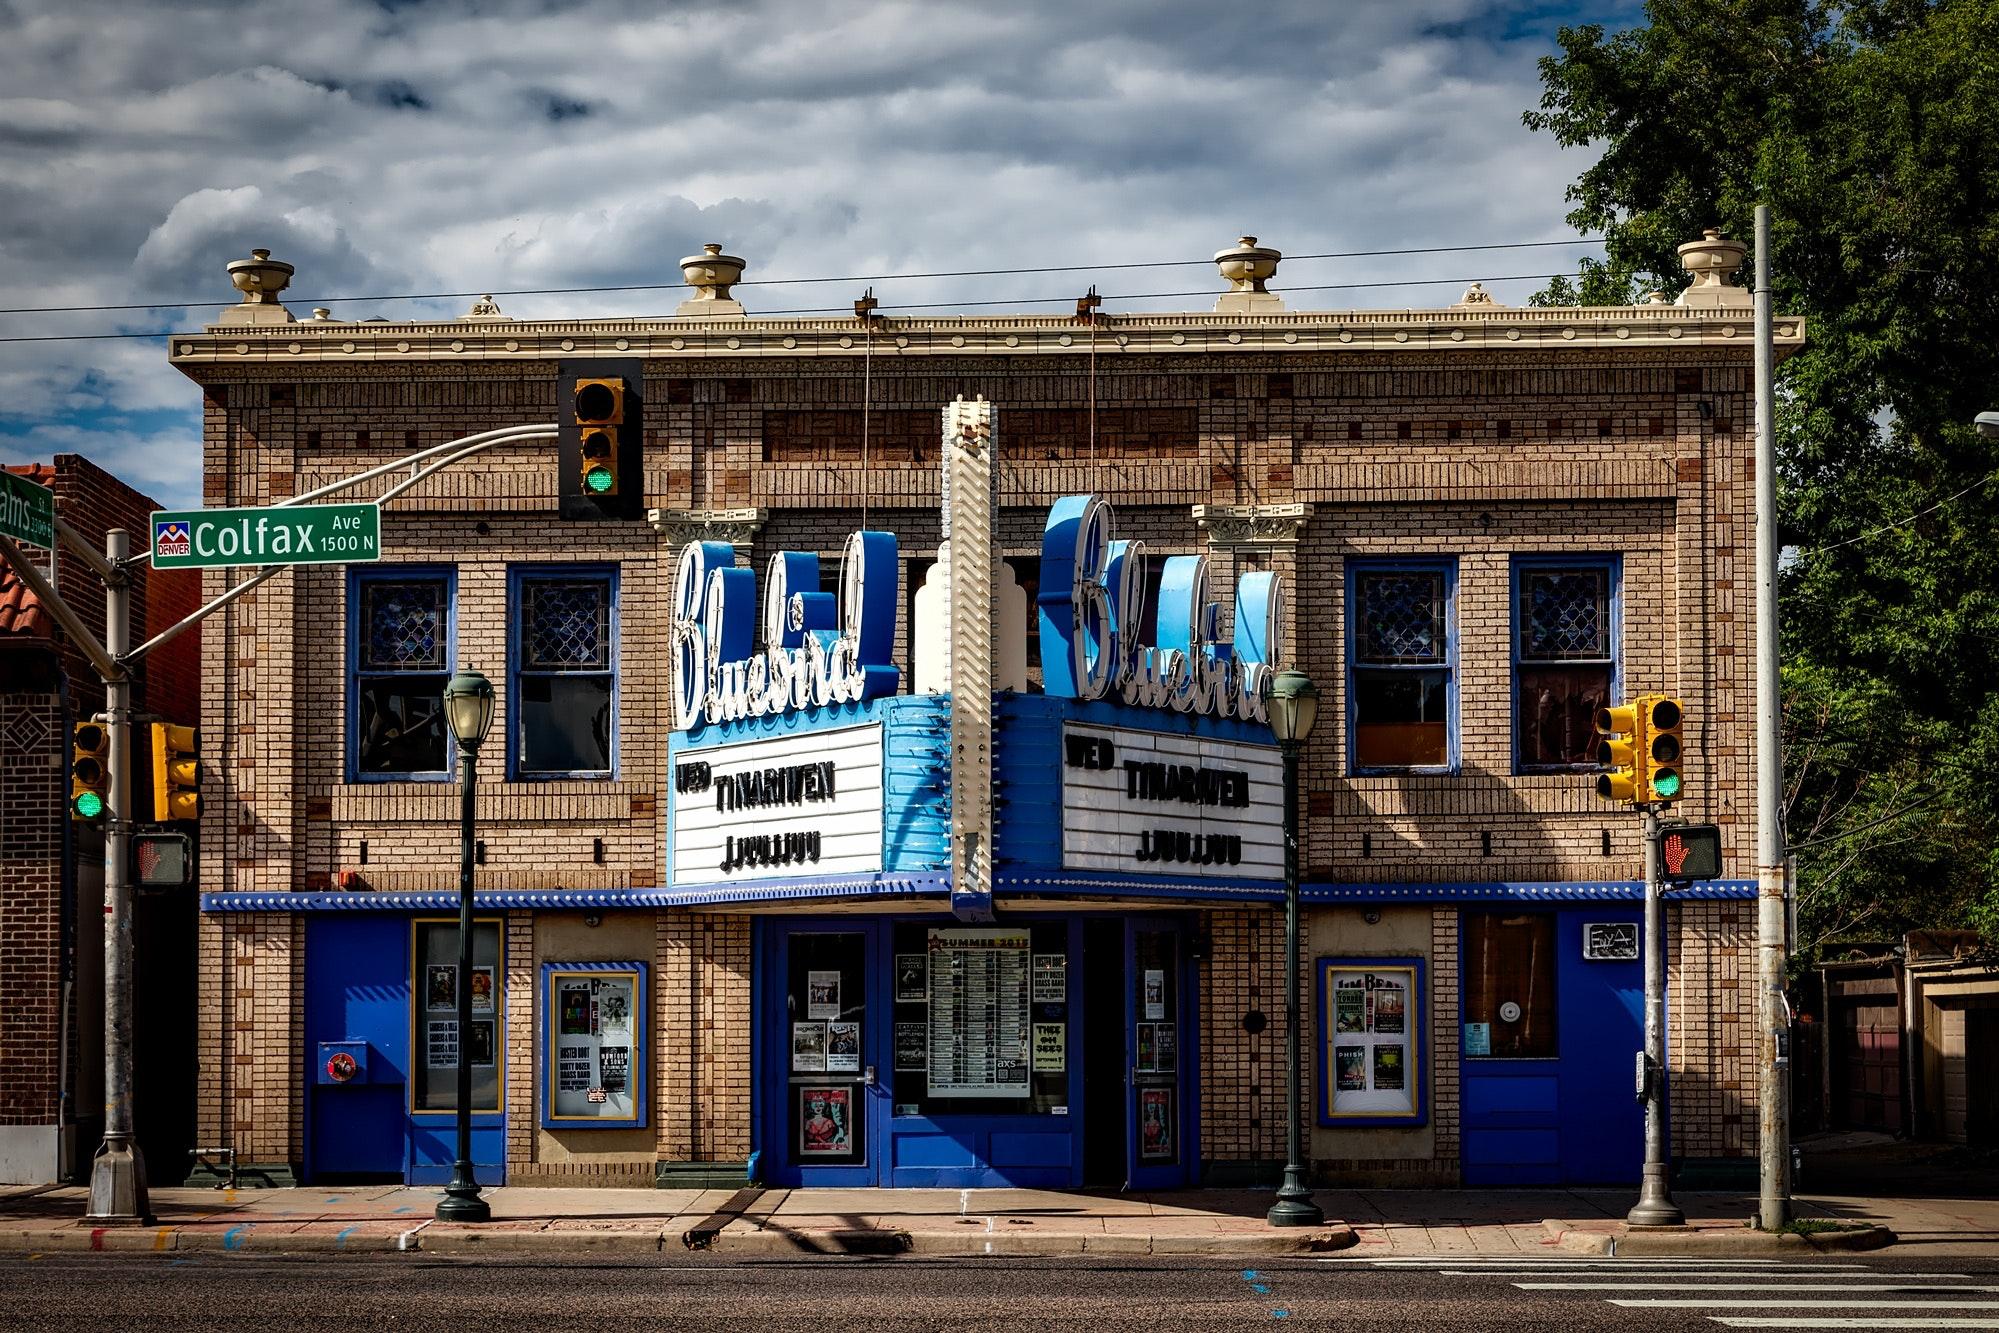 architecture-bluebird-theatre-building-208647.jpg